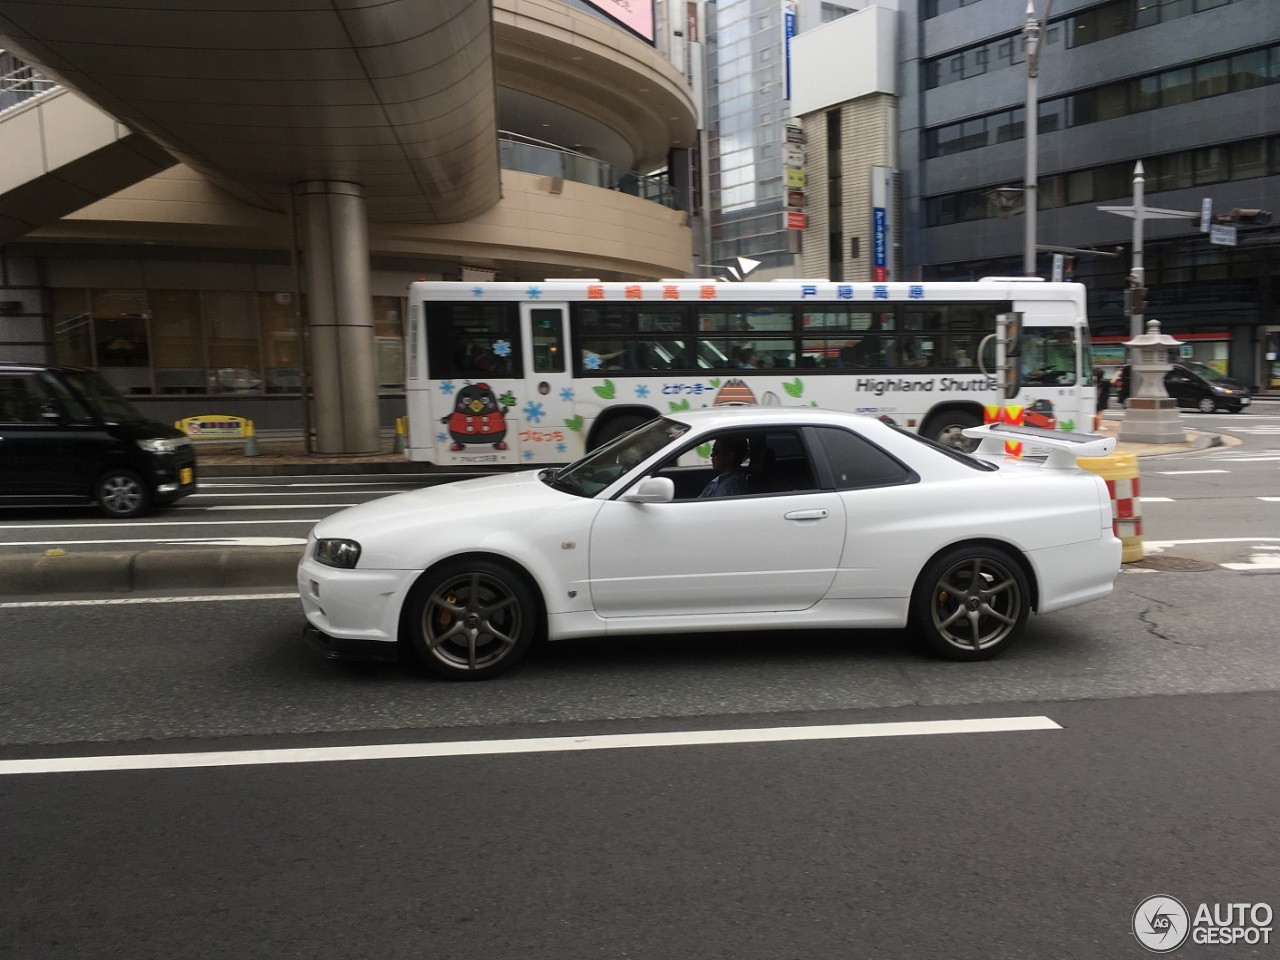 Nissan Skyline R34 GT R 27 August 2016 Autogespot